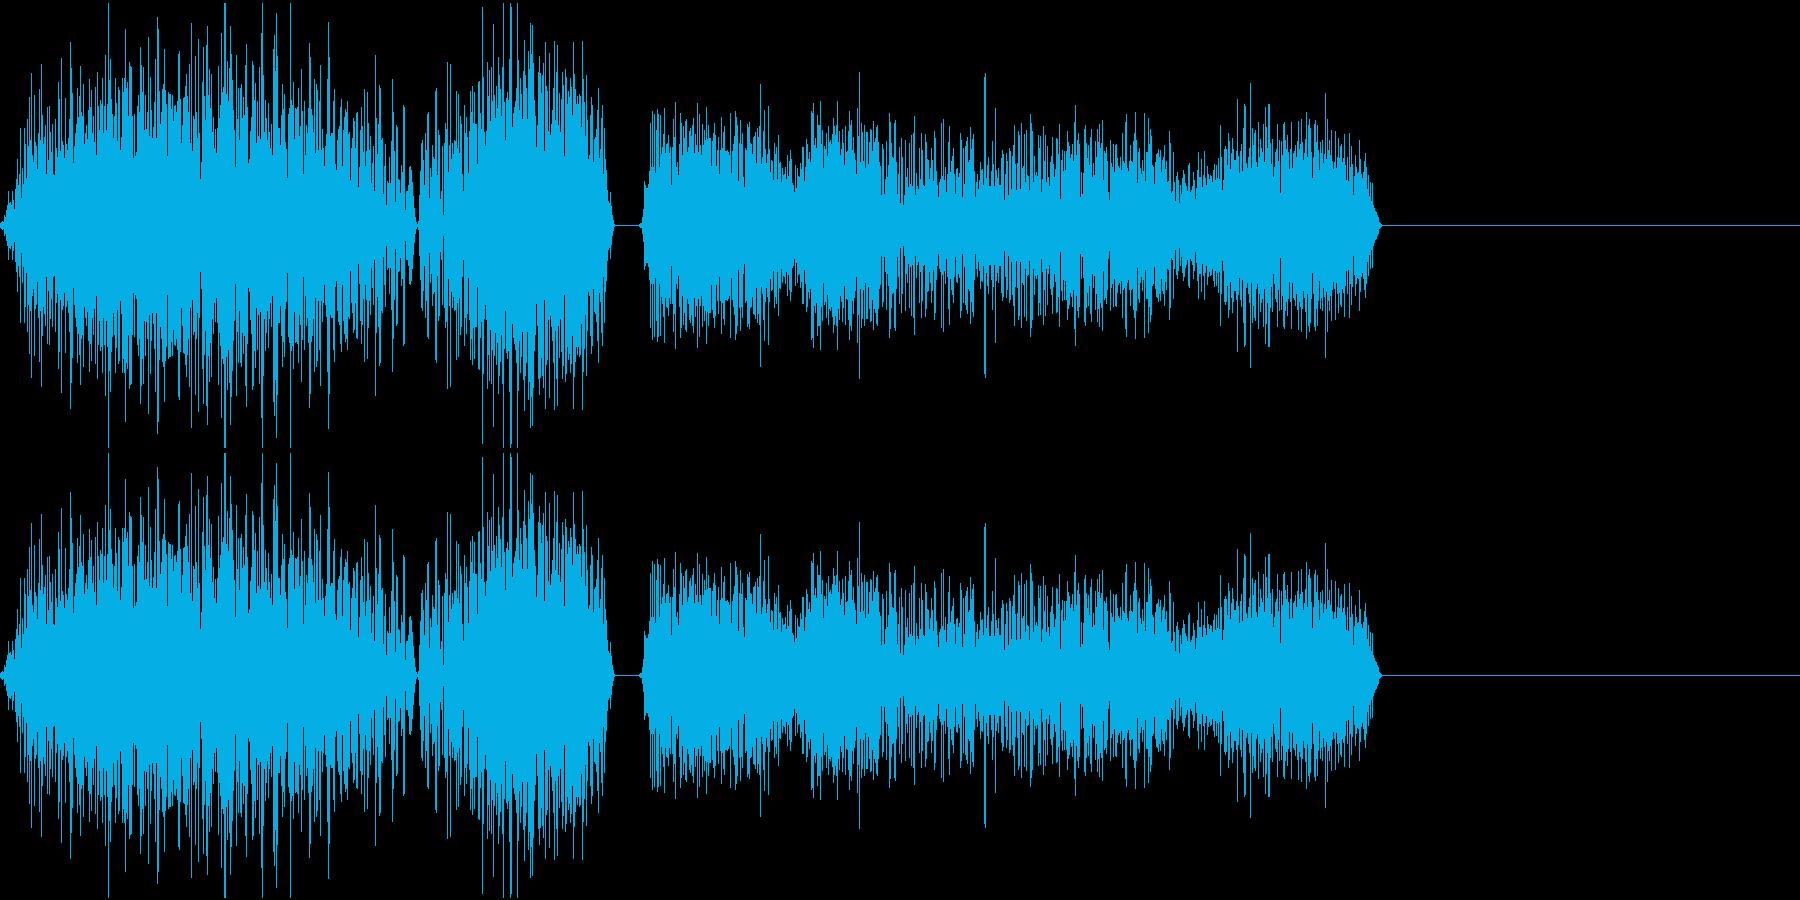 DJプレイ スクラッチ・ノイズ 104の再生済みの波形